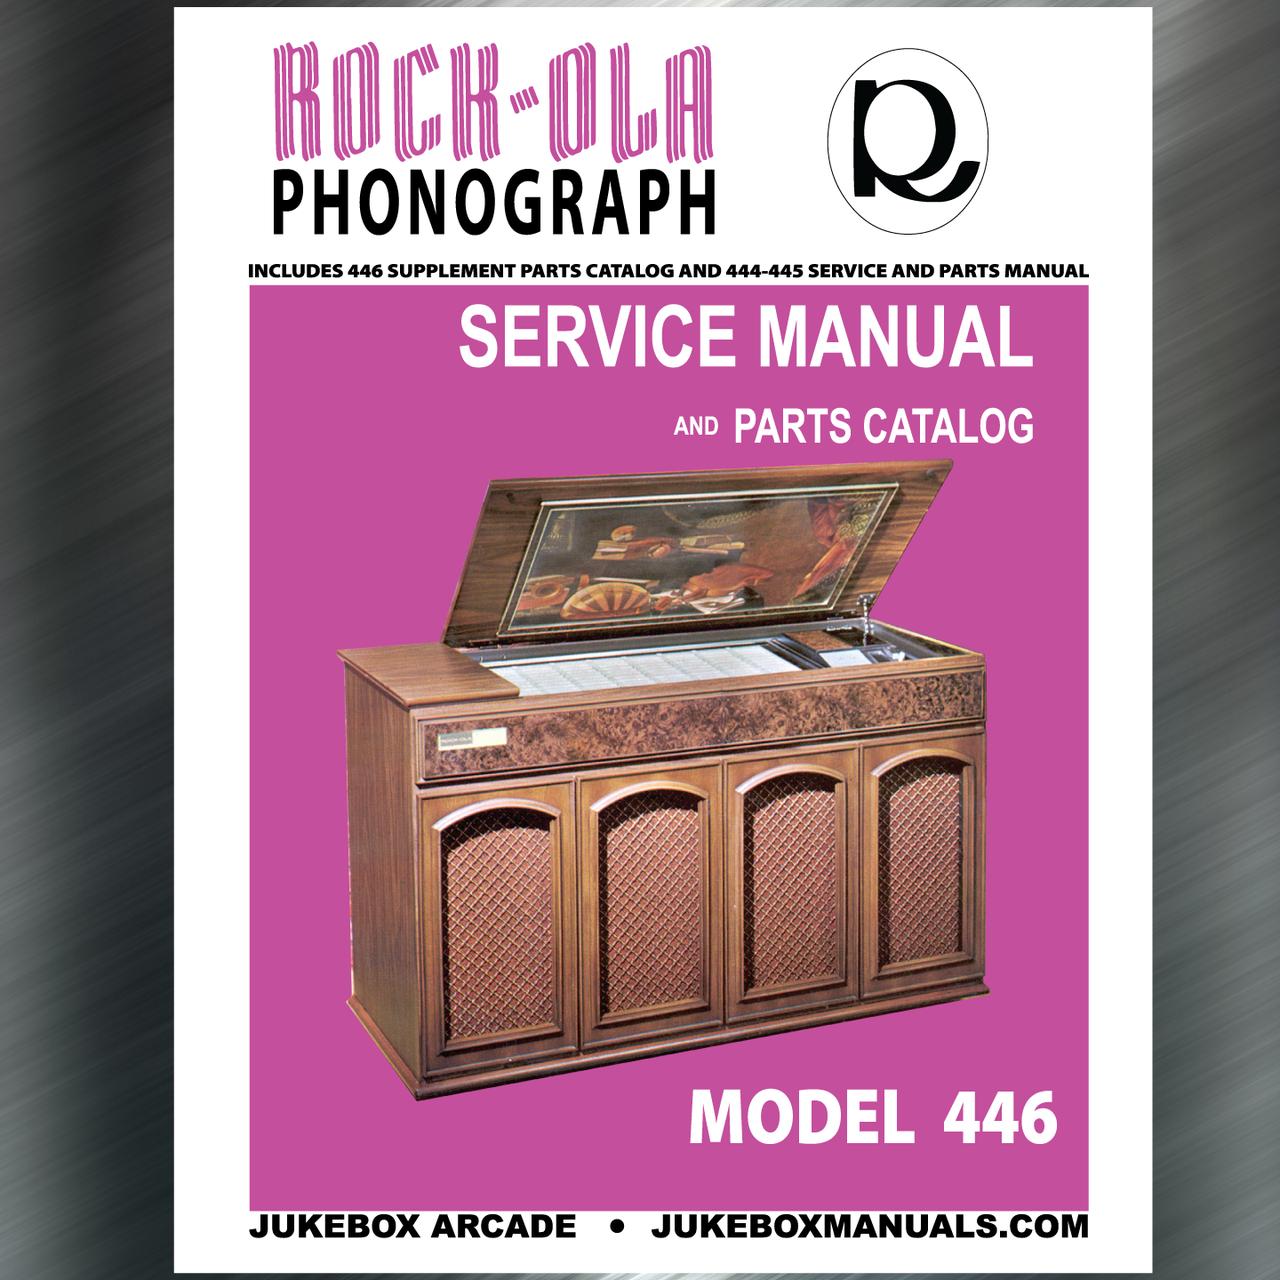 Rock Ola Jukebox Manuals Literature Instant Pdf Downloads Jukebox Arcade